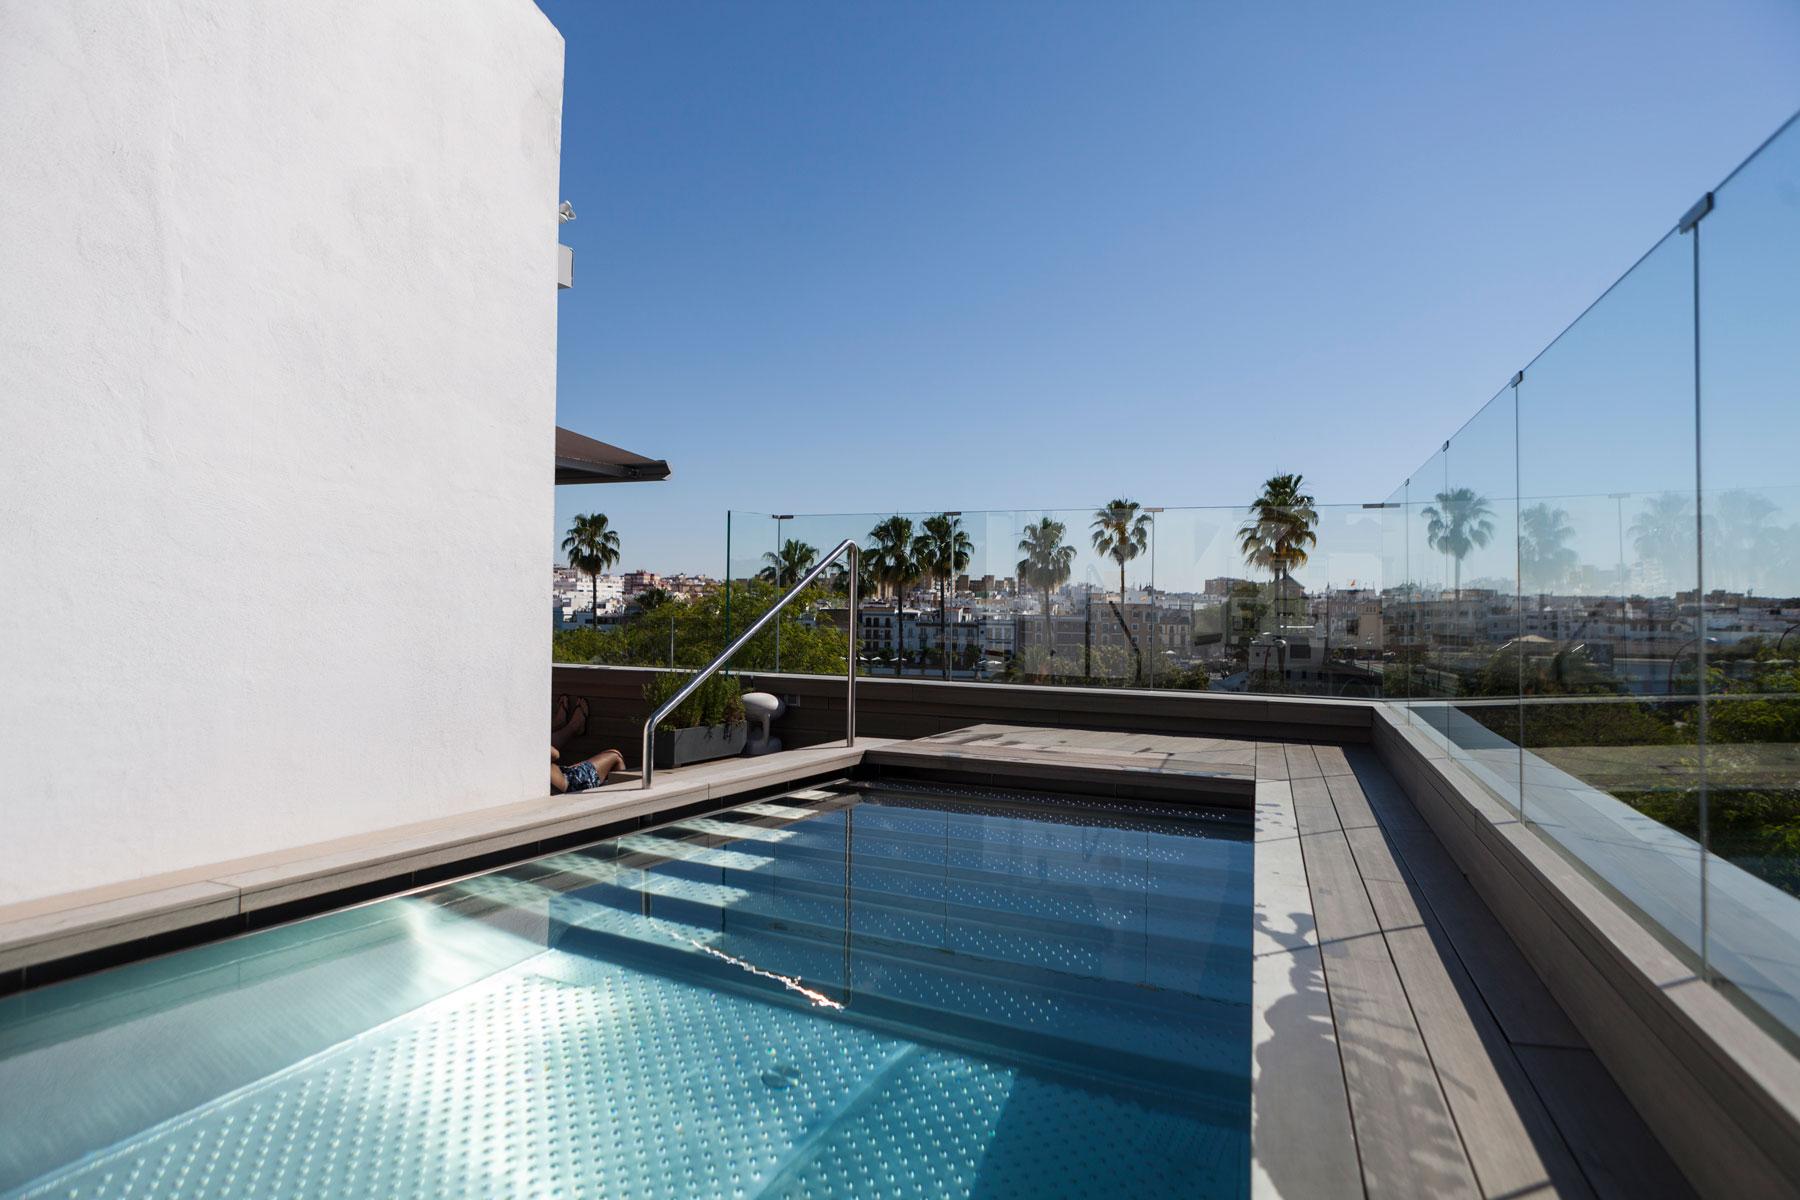 hotel kivir piscina